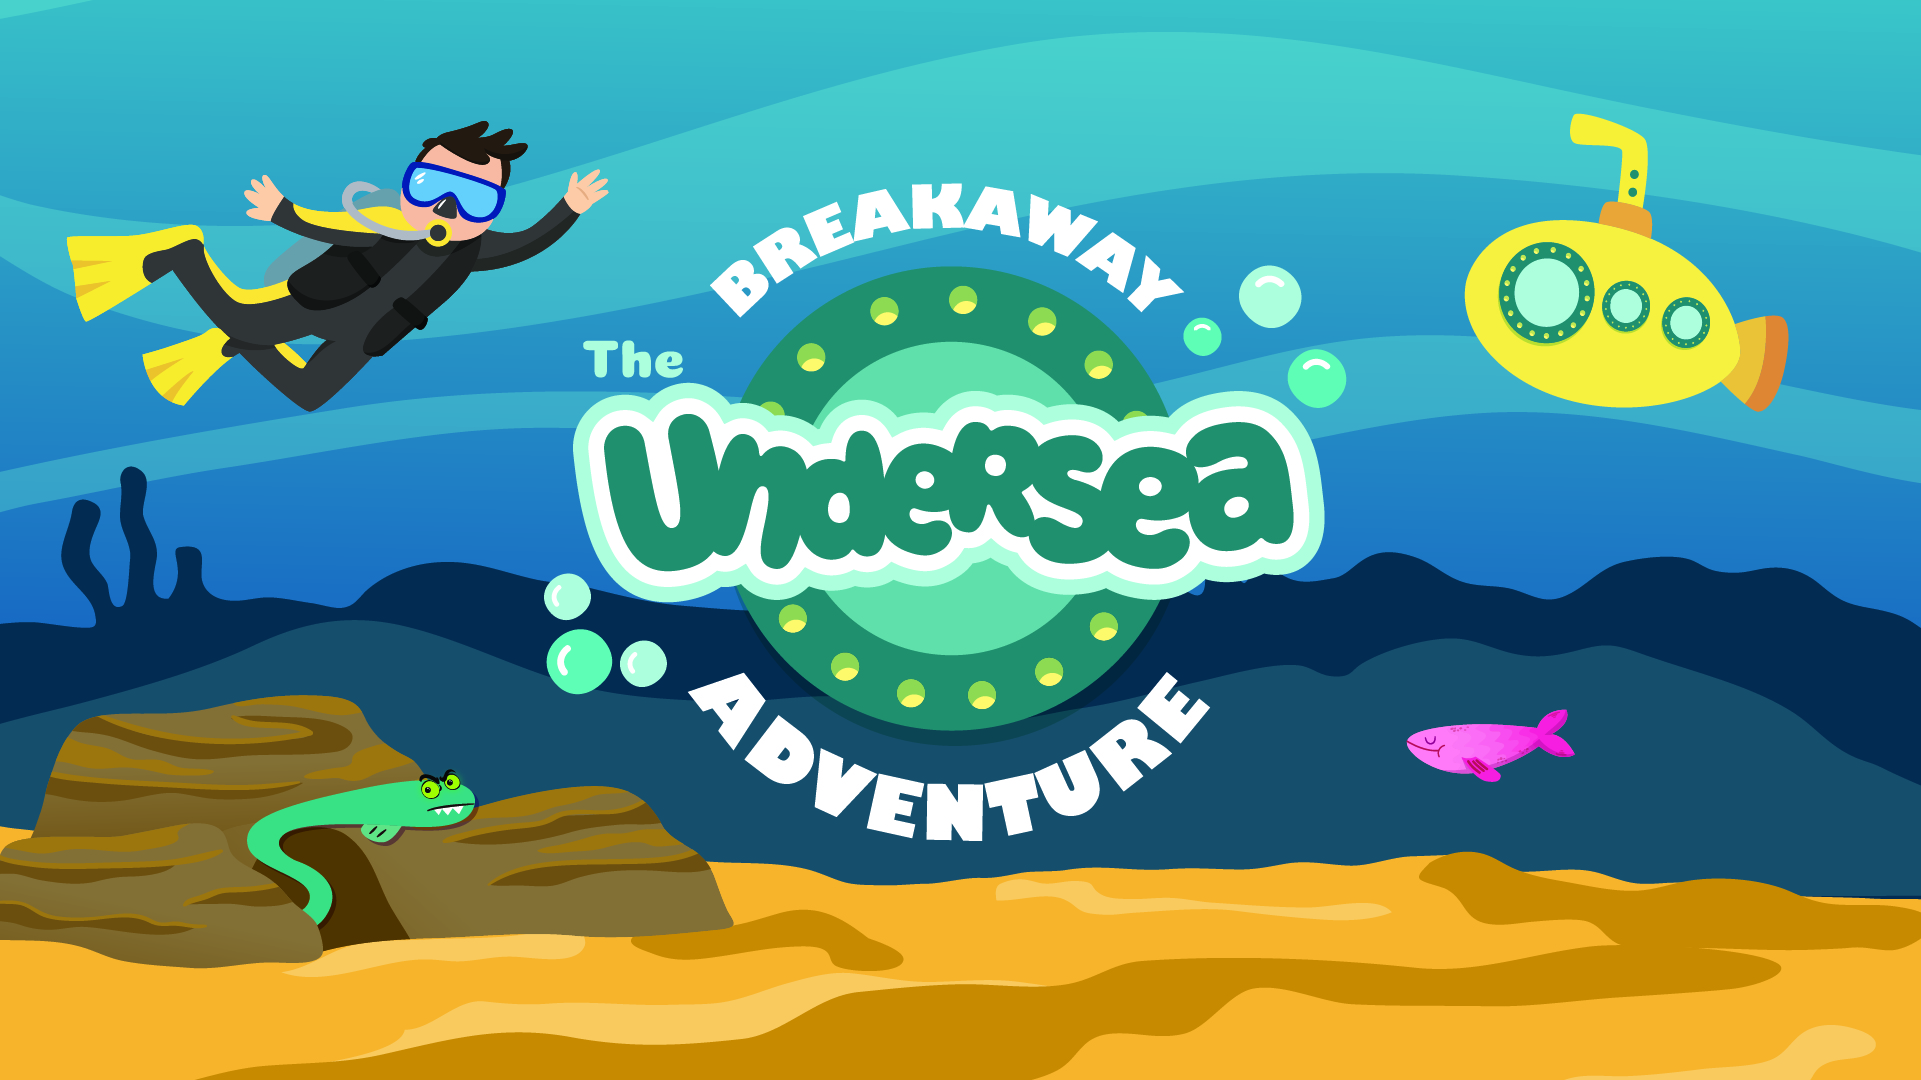 Breakaway the undersea adventure logo wbackground final pco event cover